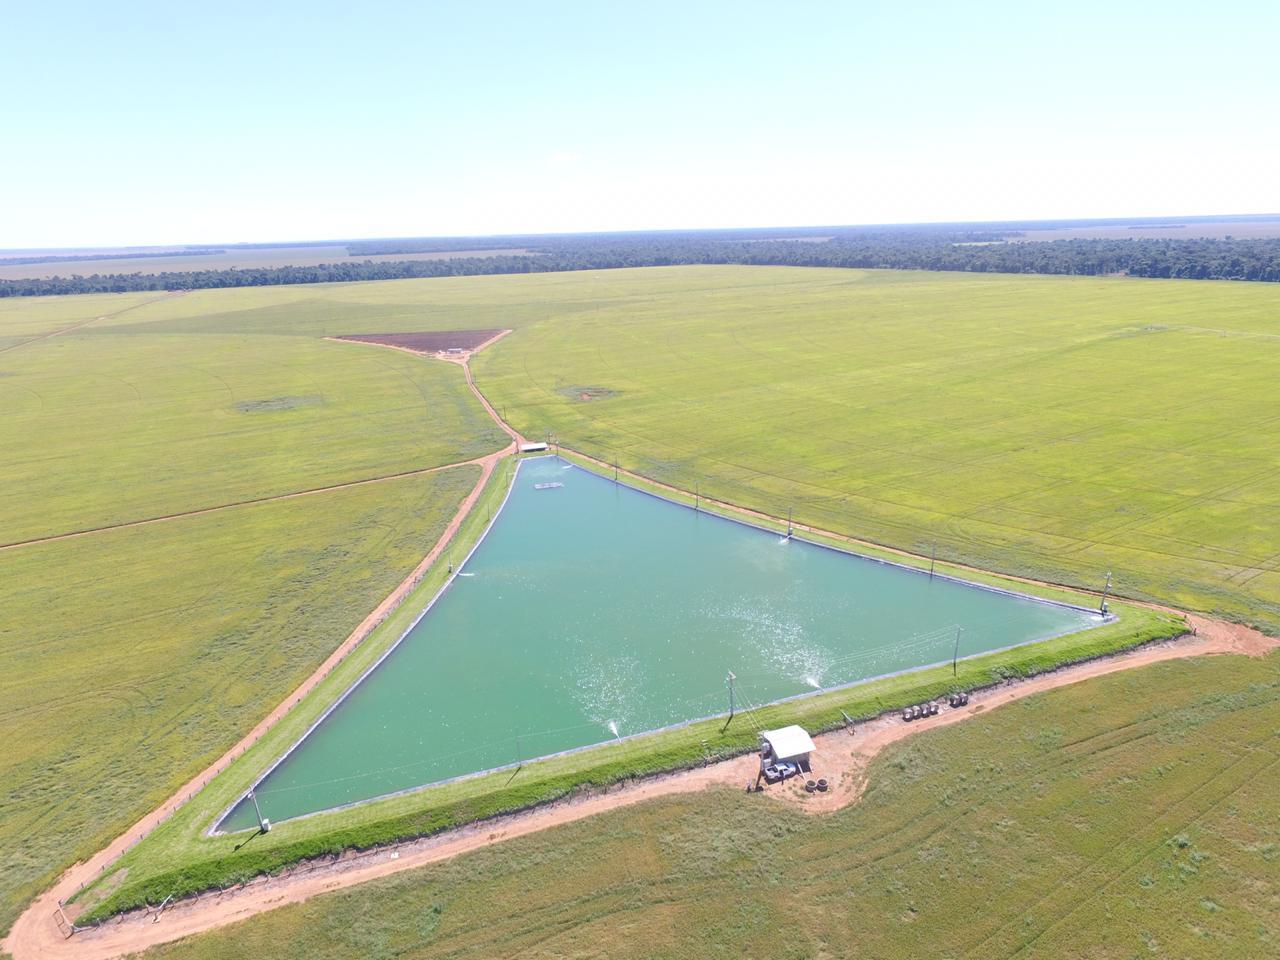 Crise hídrica acende sinal de alerta no campo